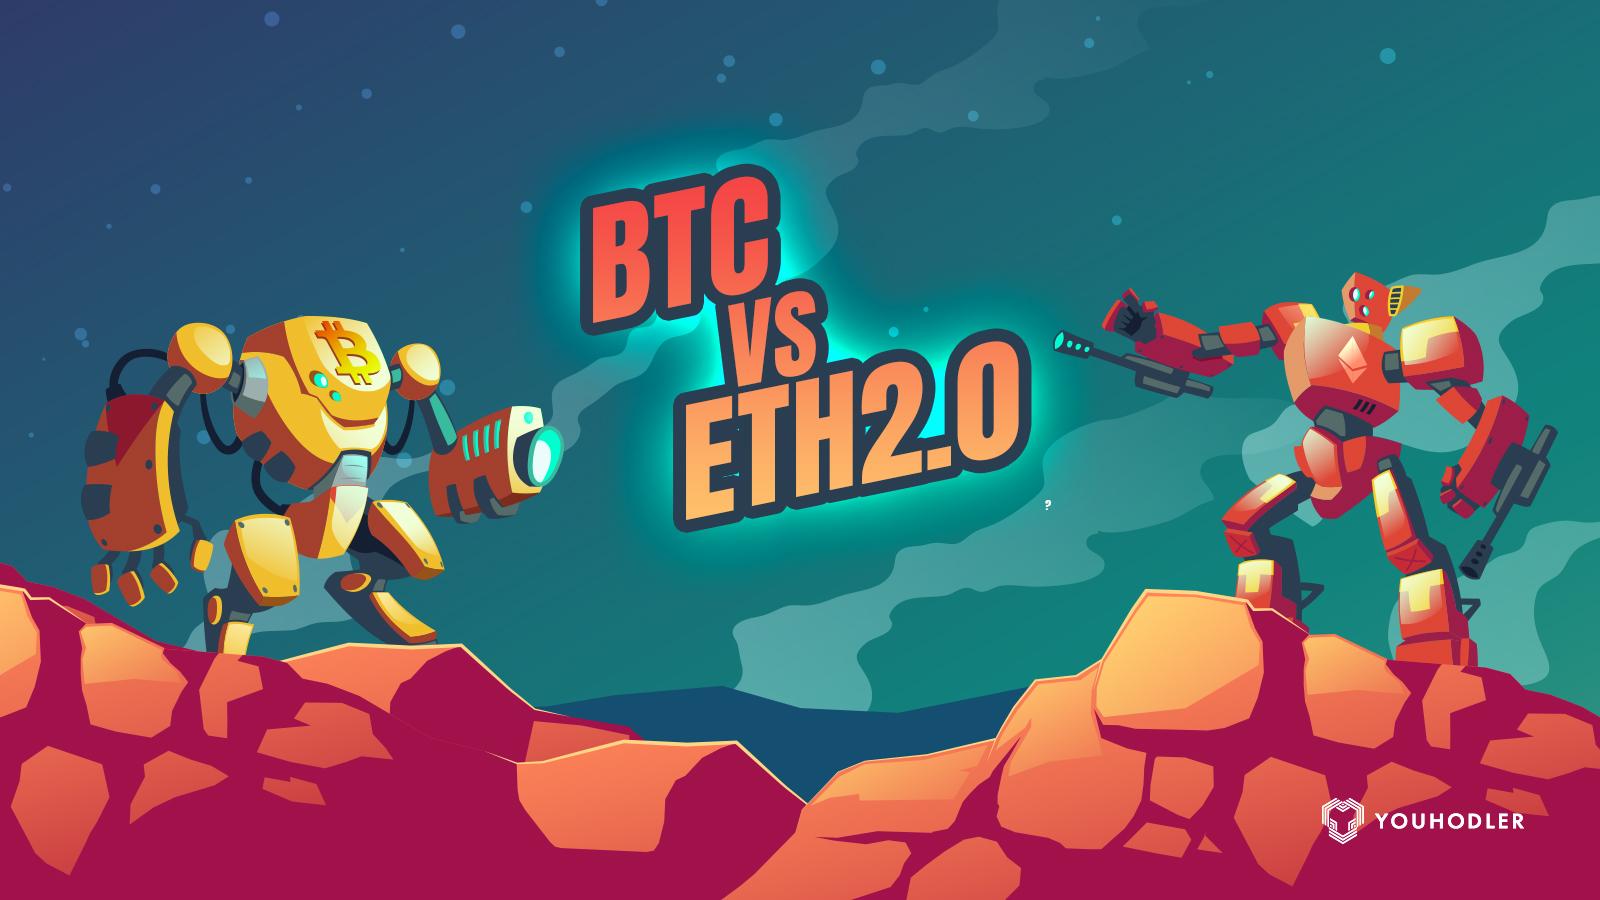 Bitcoin, ethereum2.0, ethereum, ETH, ethereum lending, bitcoin dominance